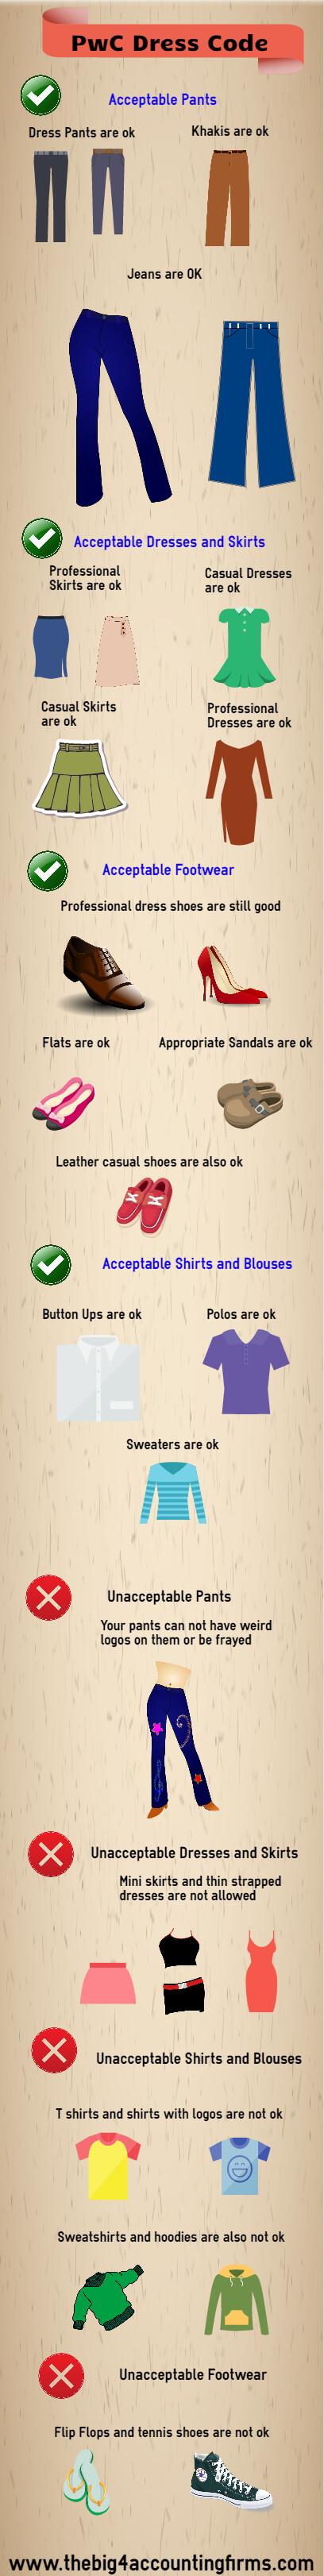 PwC Dress Code